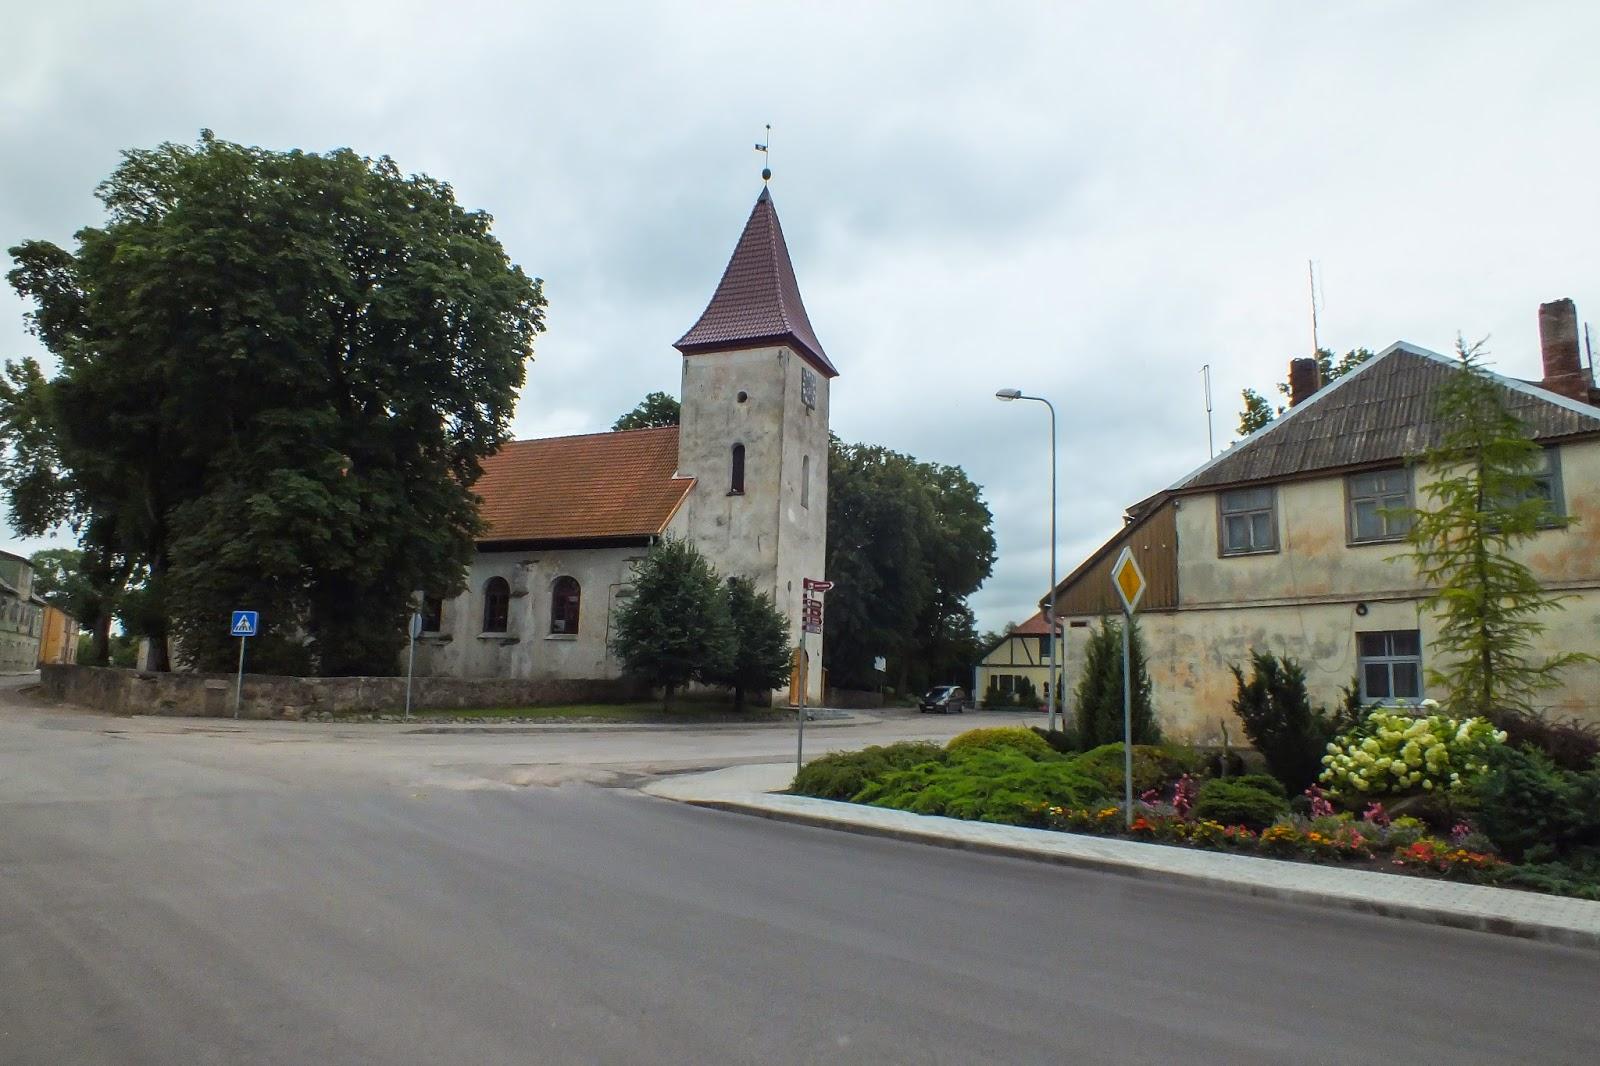 Замок в Дурбе (Durbe castle)